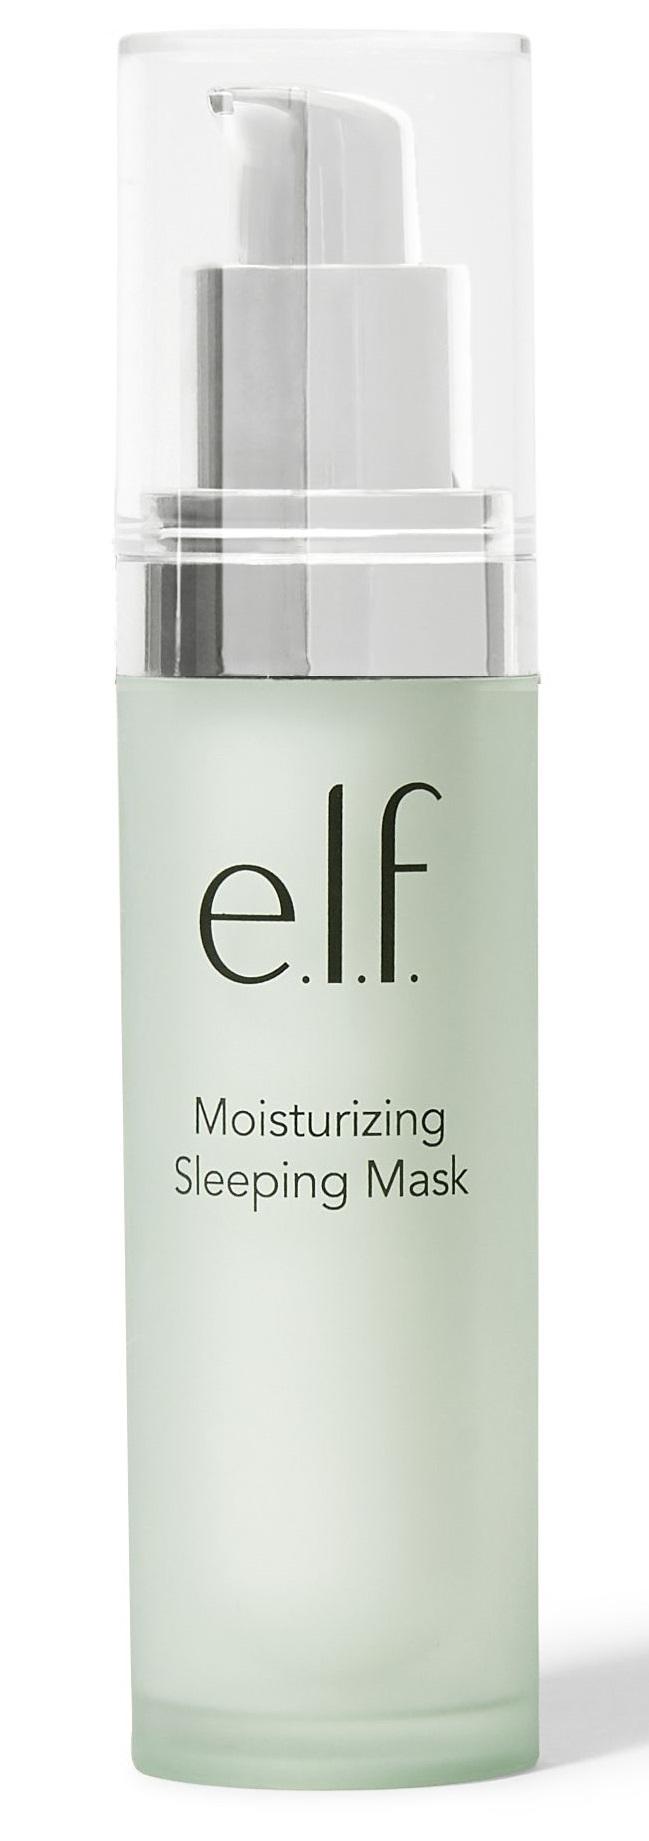 e.l.f. Moisturizing Sleeping Mask